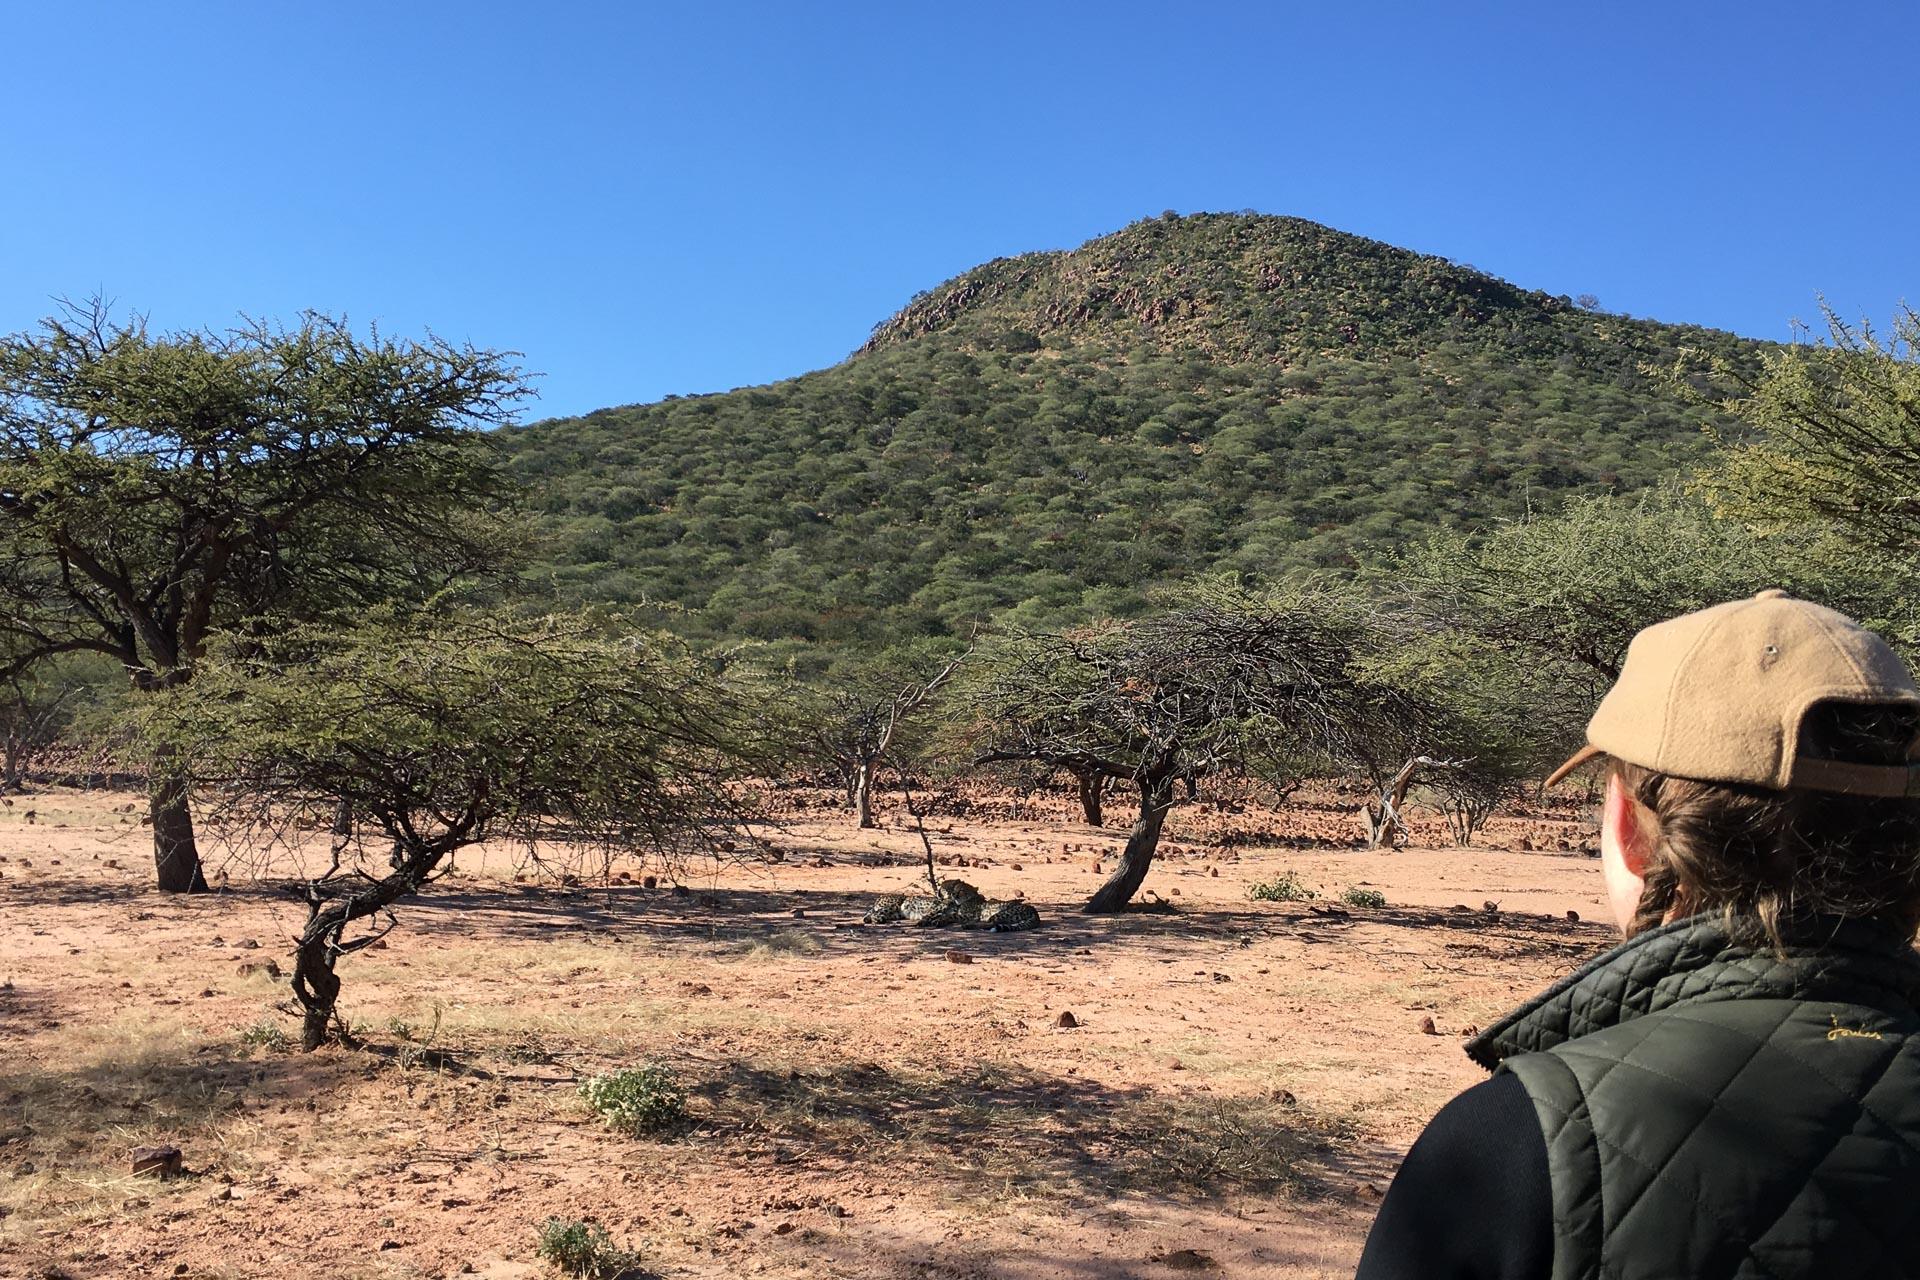 Okonjima-Namibia-Globetrotter-Select-5